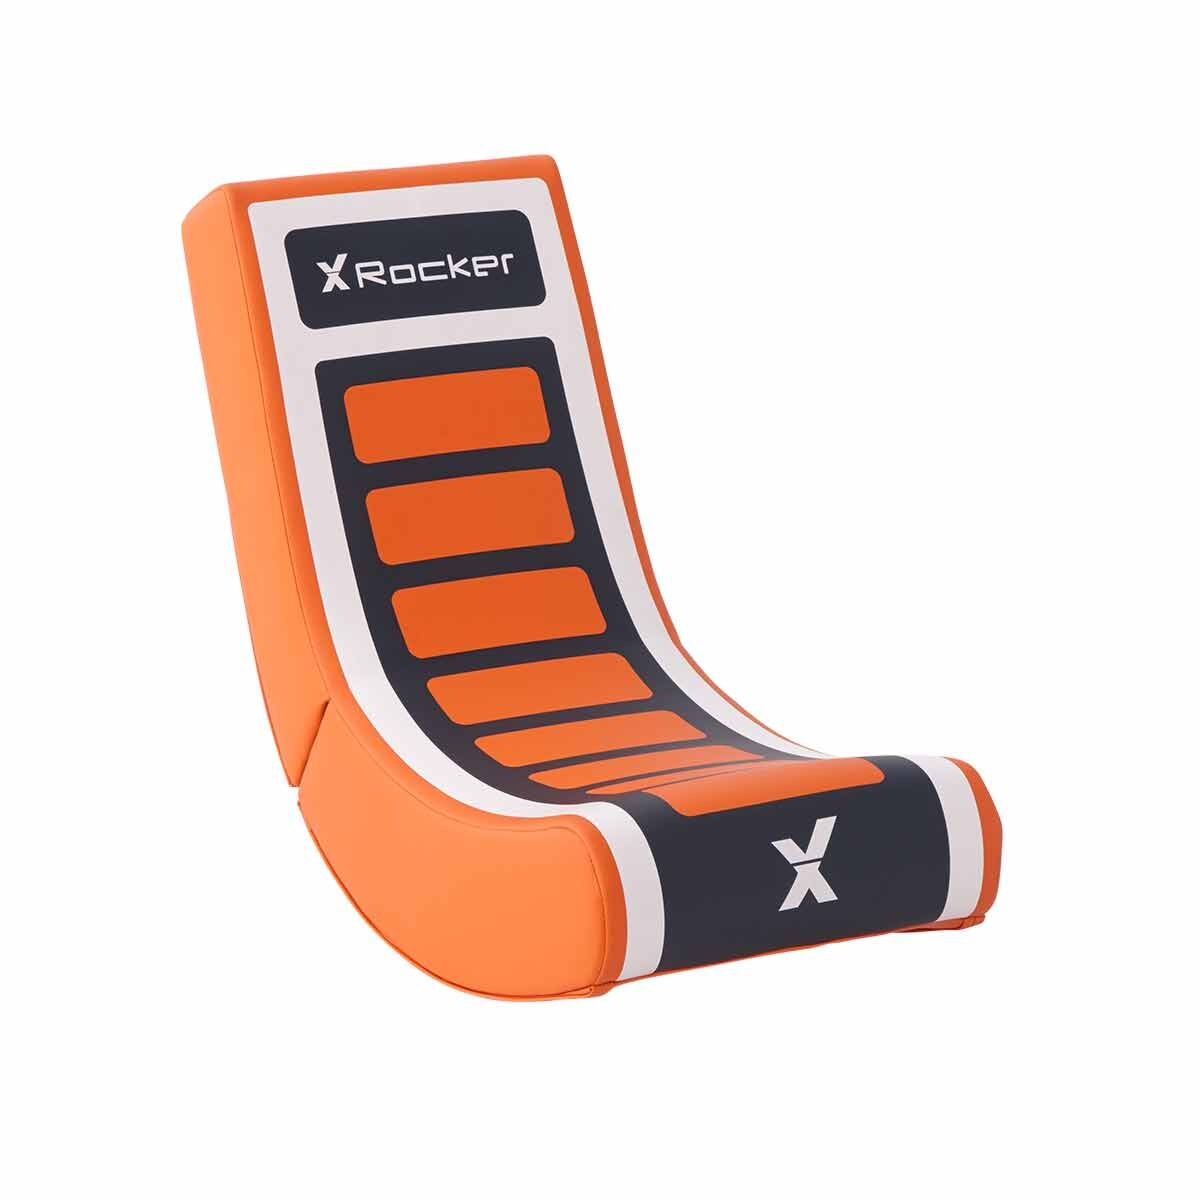 X Rocker Video Floor Gaming Chair